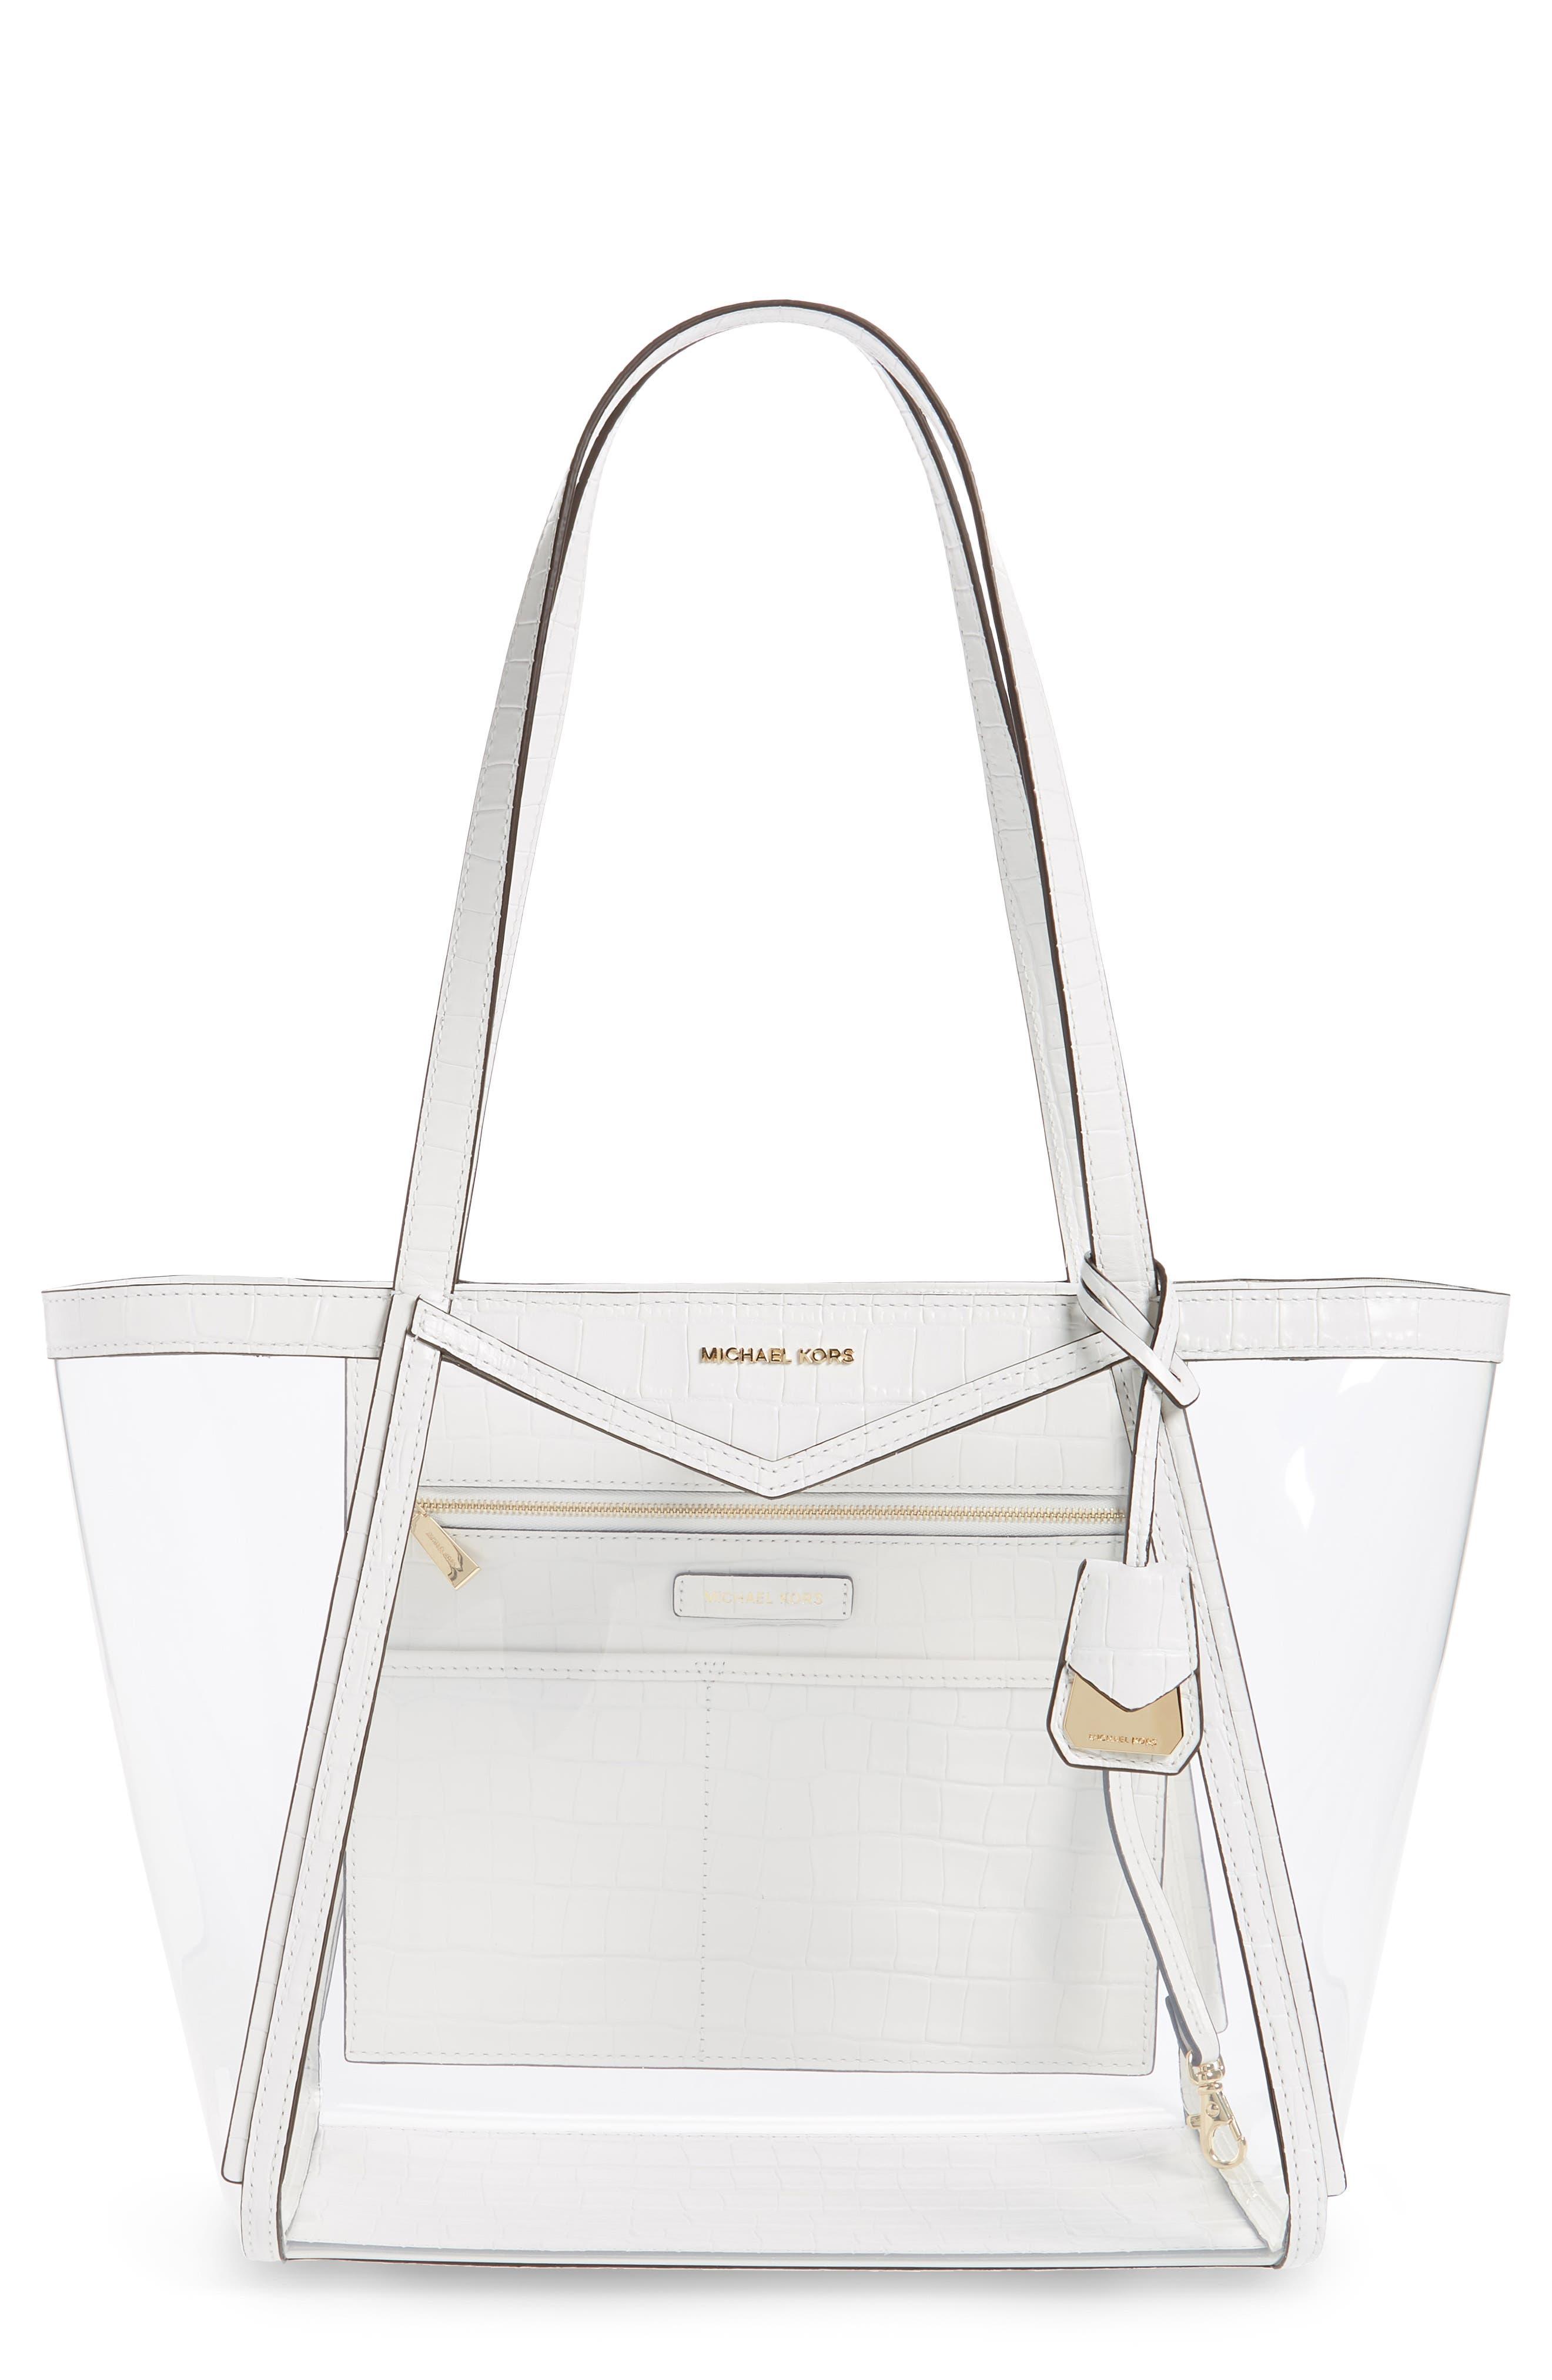 81f80ce14a09 michael kors handbags | Nordstrom